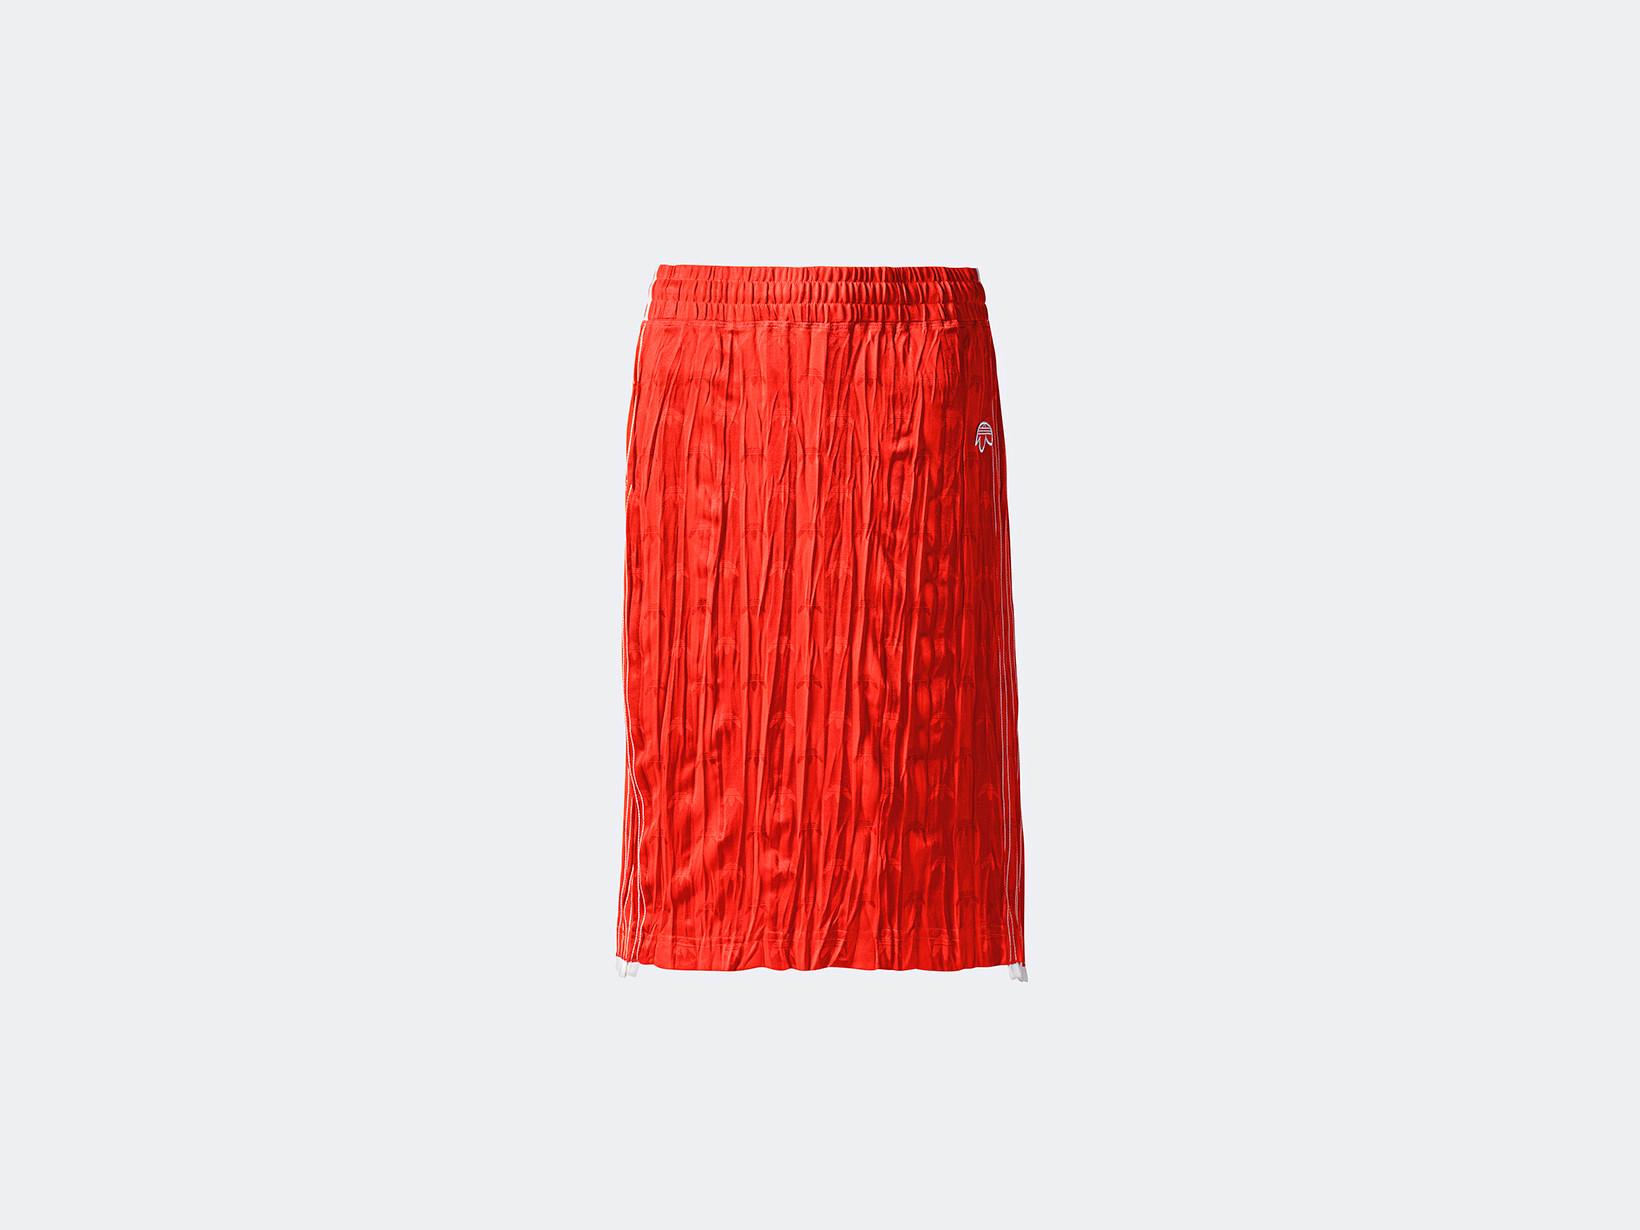 https---hypebeast.com-image-2018-06-adidas-originals-alexander-wang-season-3-drop-3-25